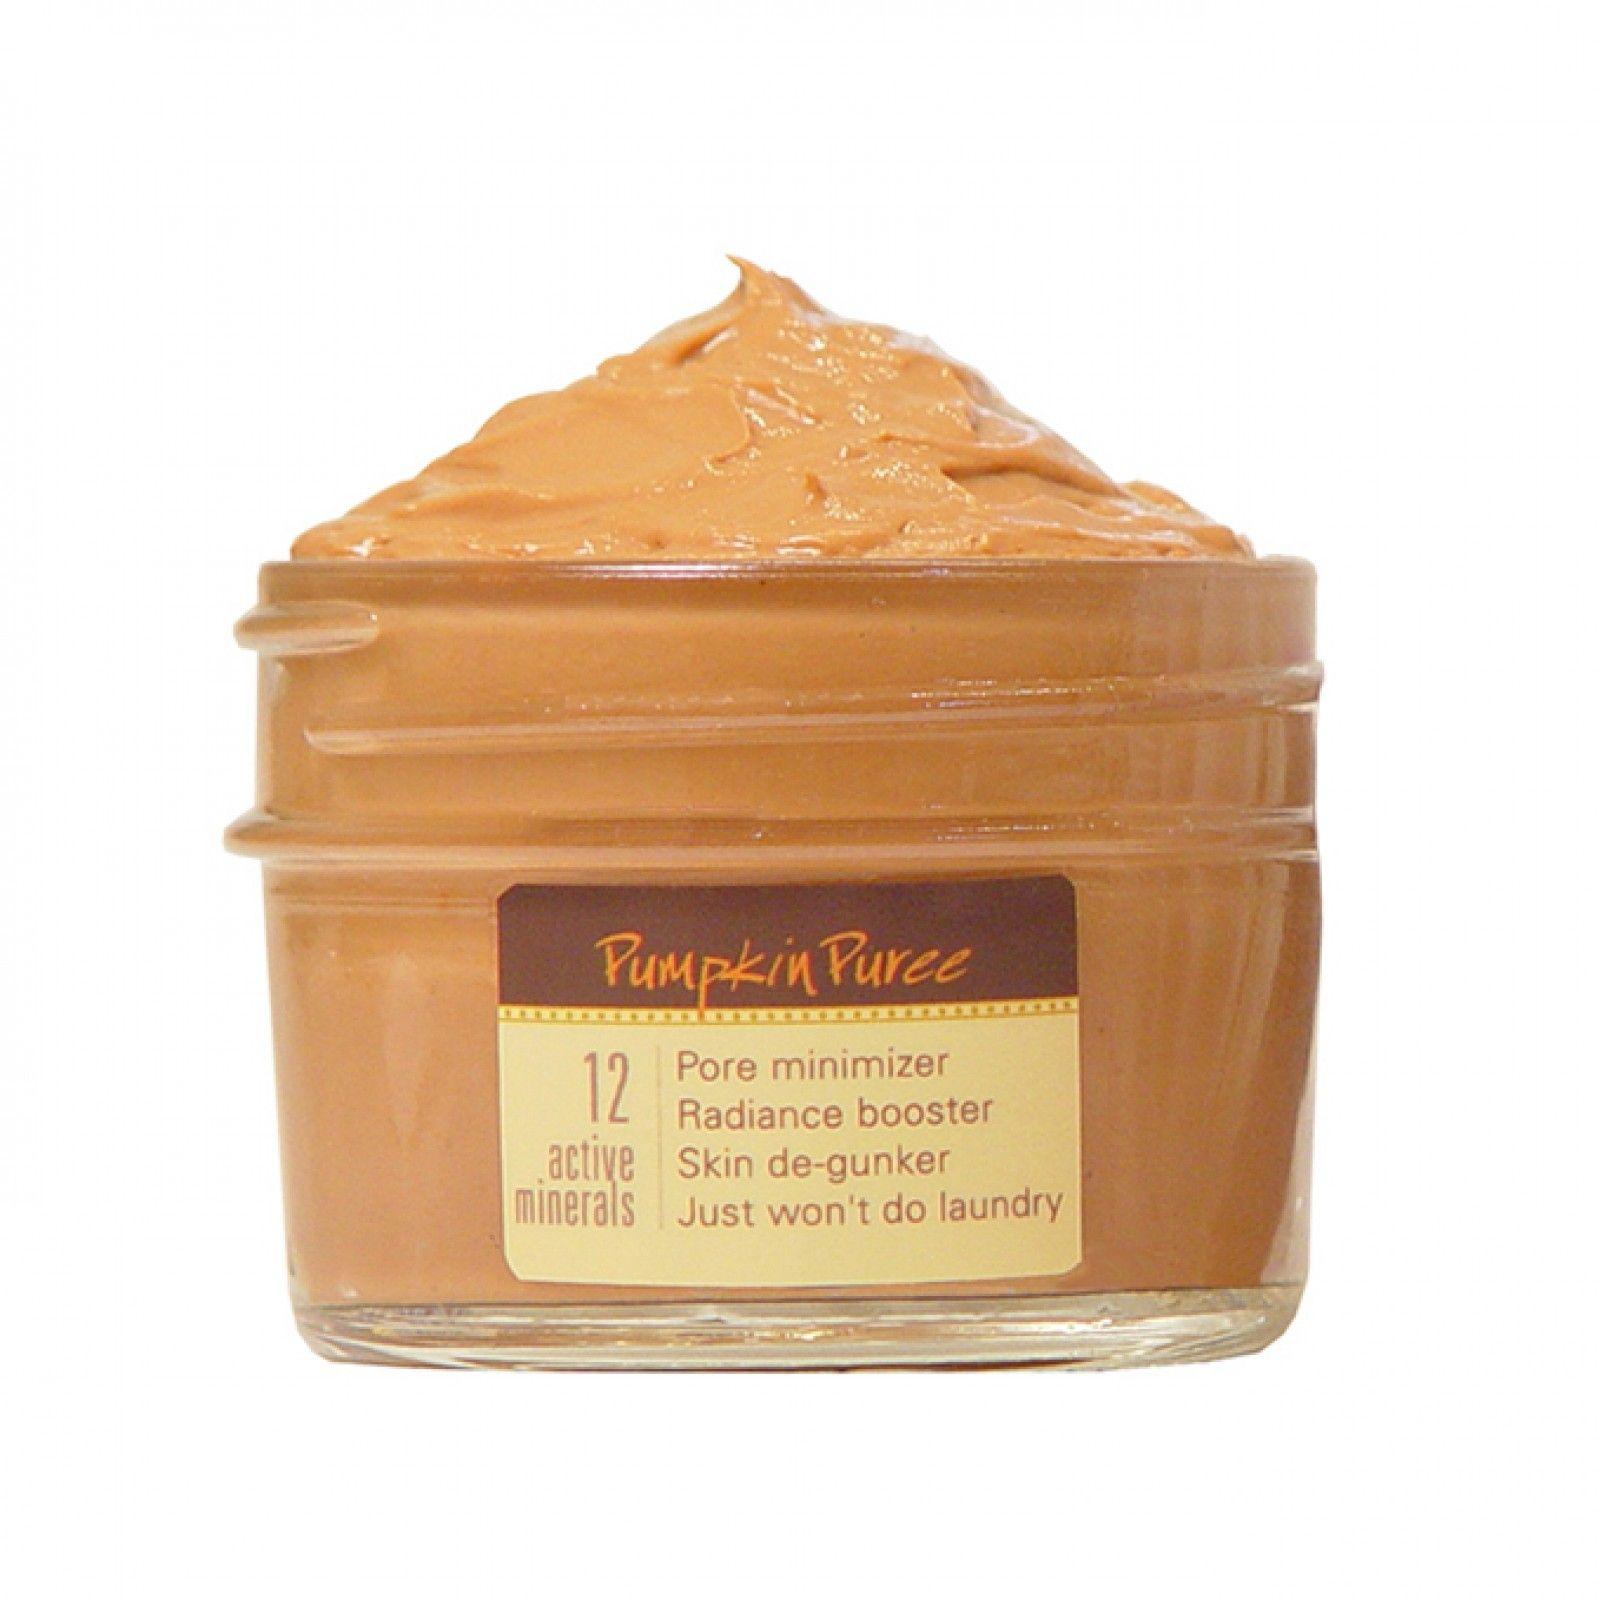 Nutrient Mud Mask with Organic Pumpkin Puree